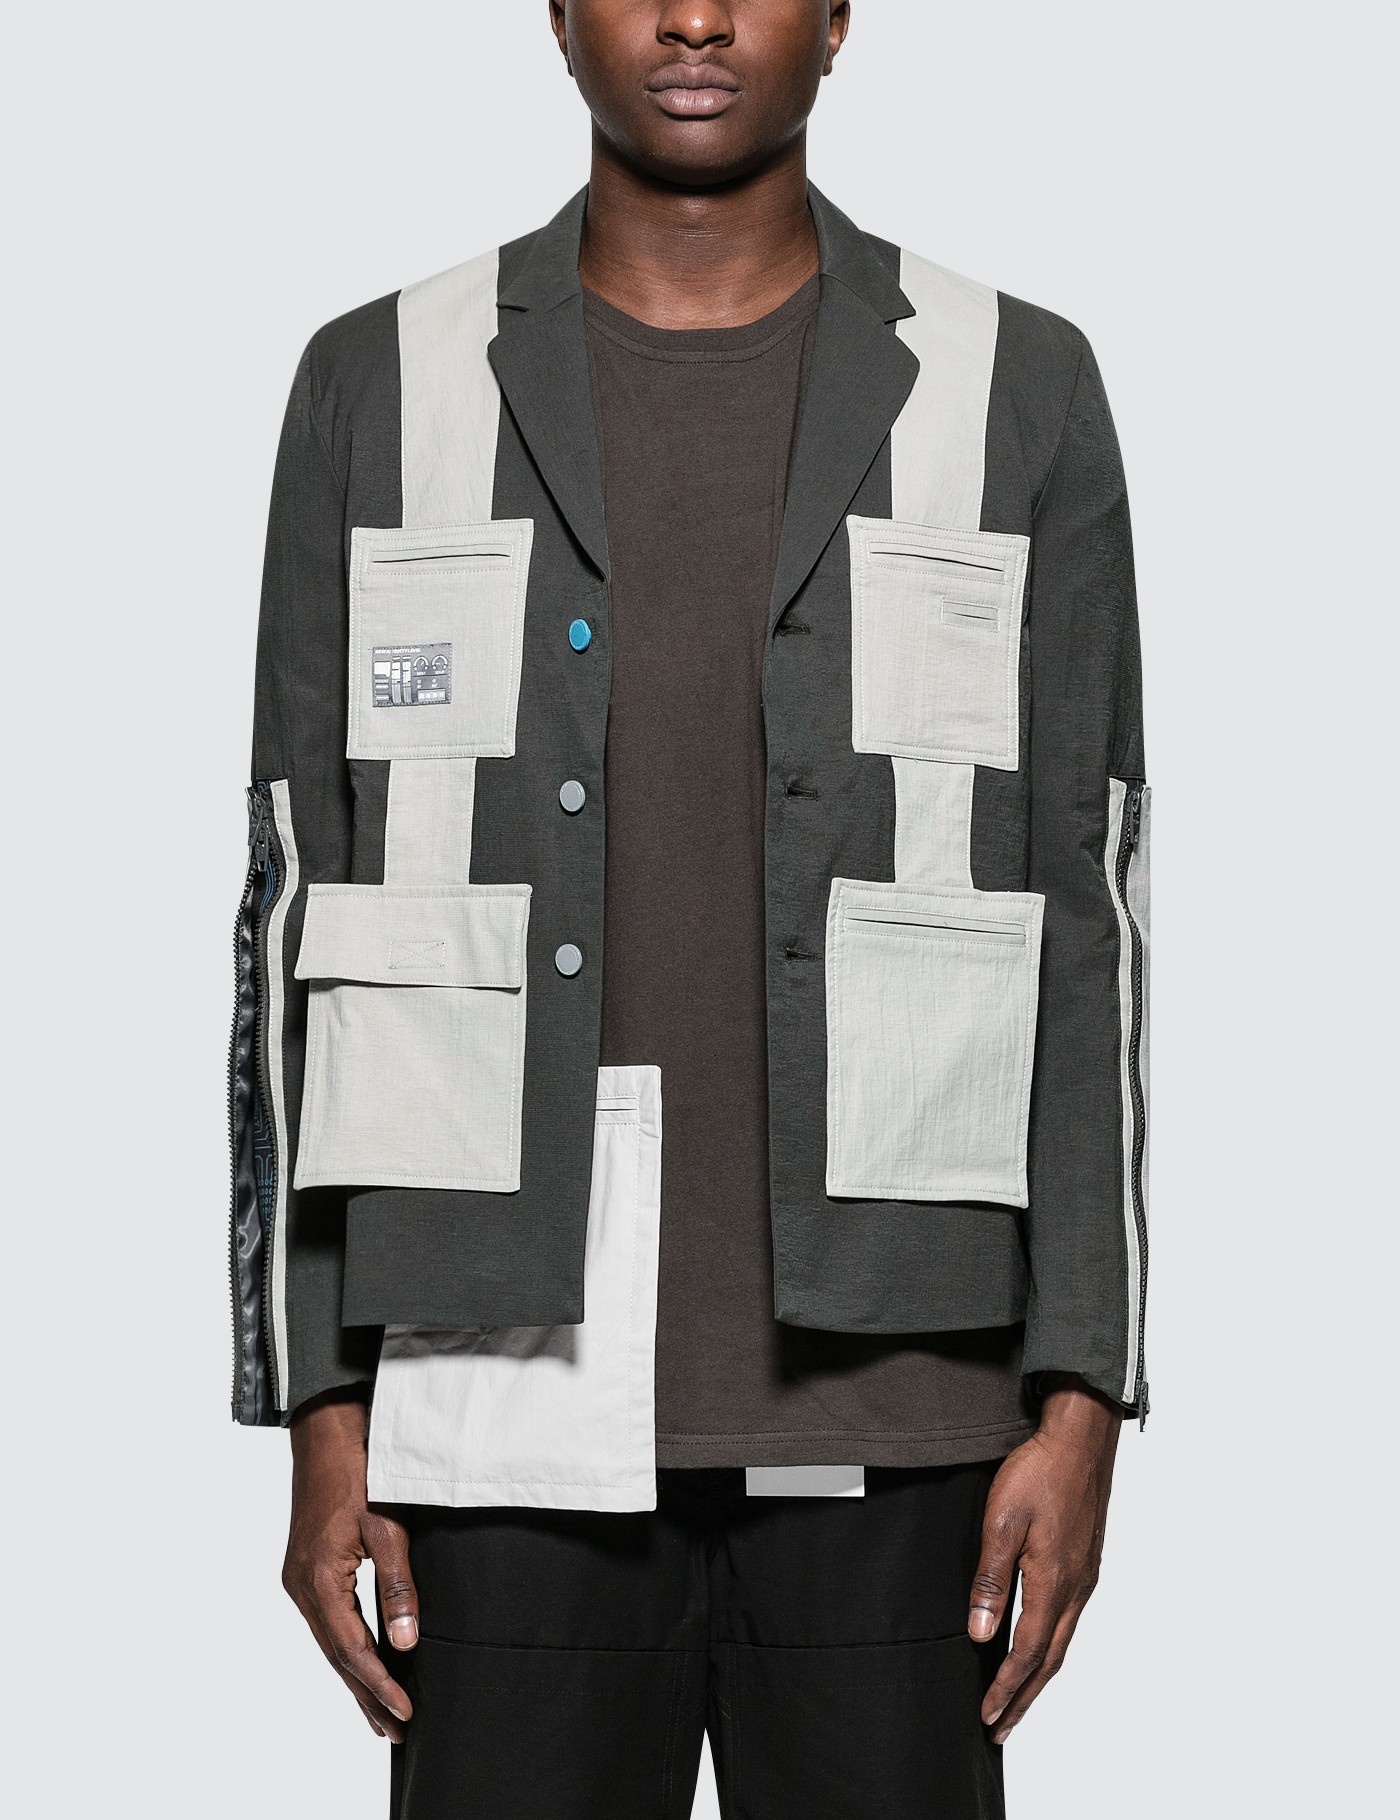 C2H4 Los Angeles Utility Tailor Jacket Picture